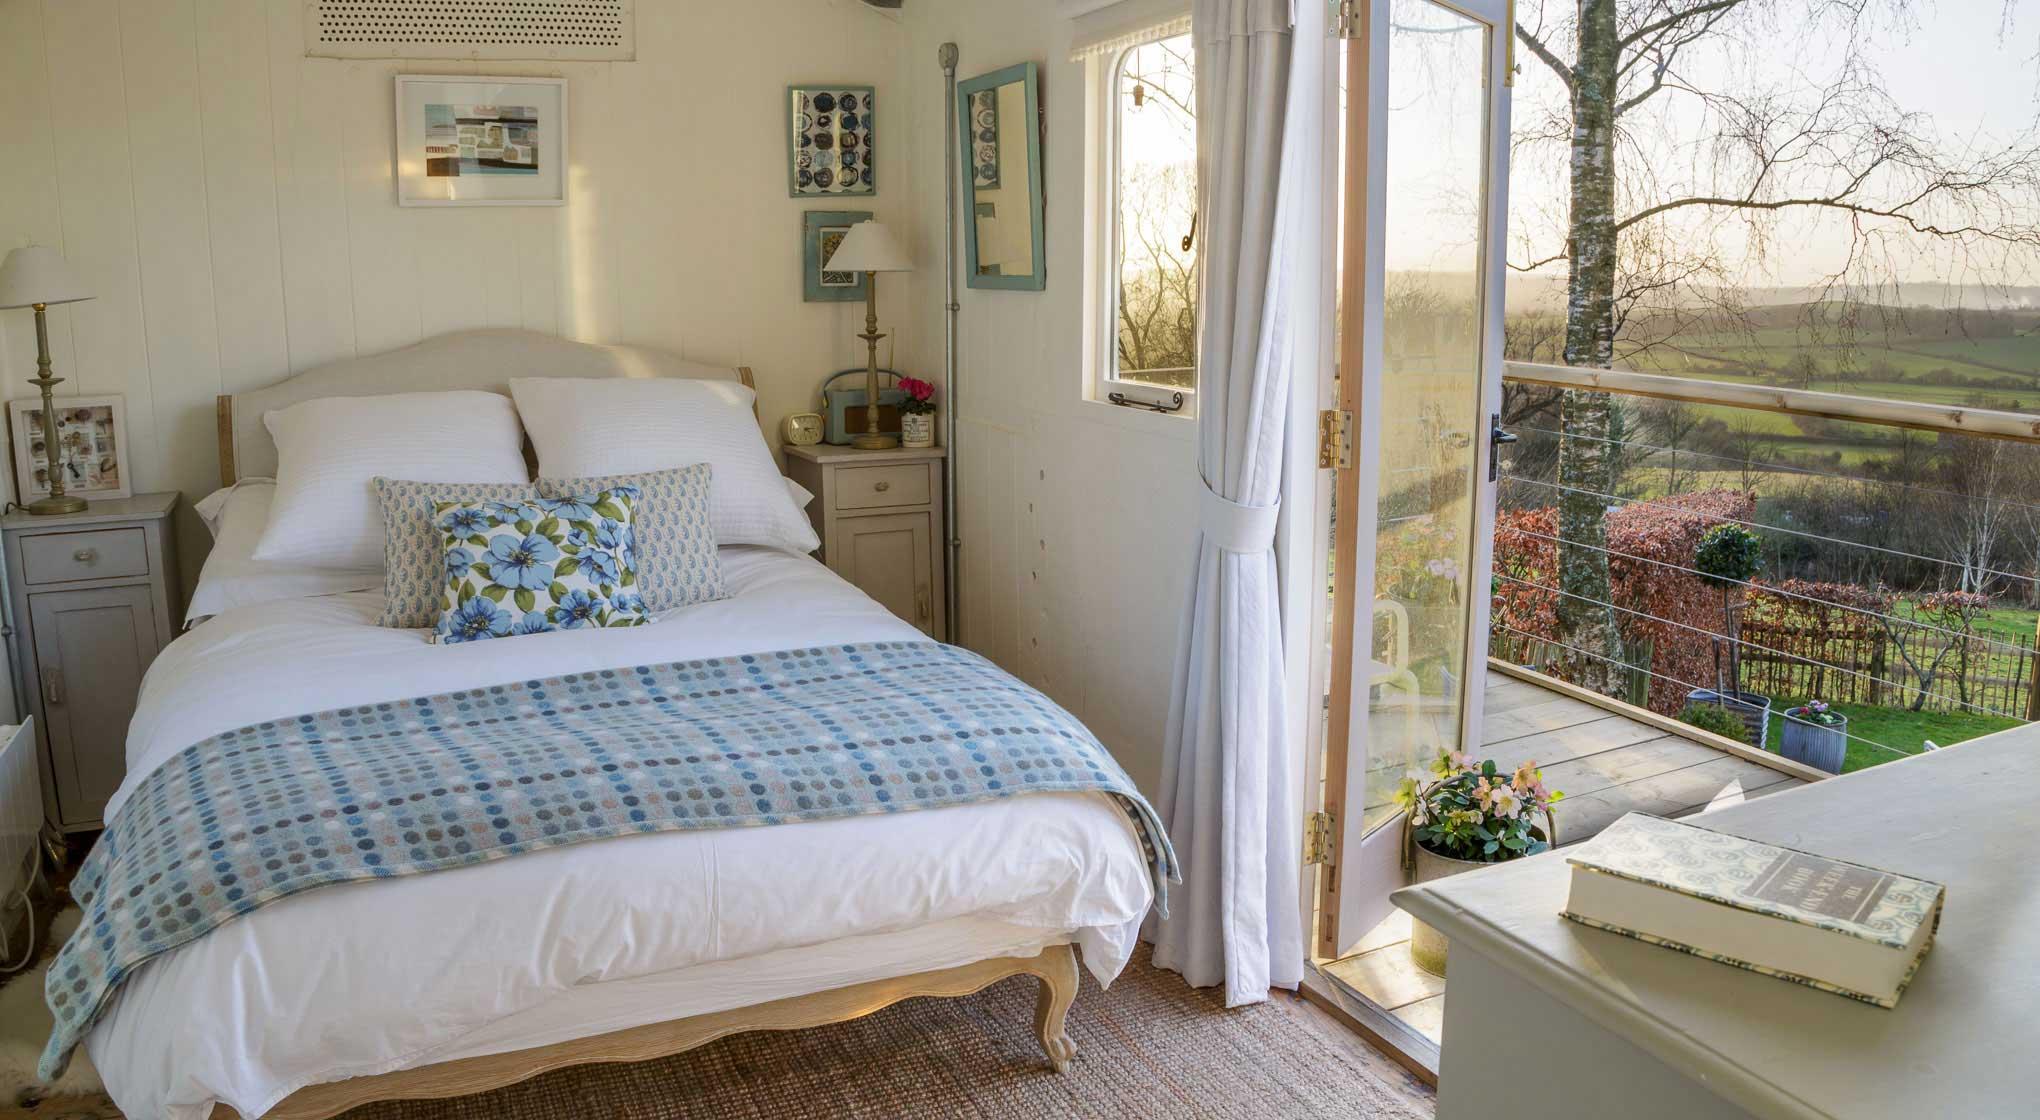 The Wagon's Bedroom